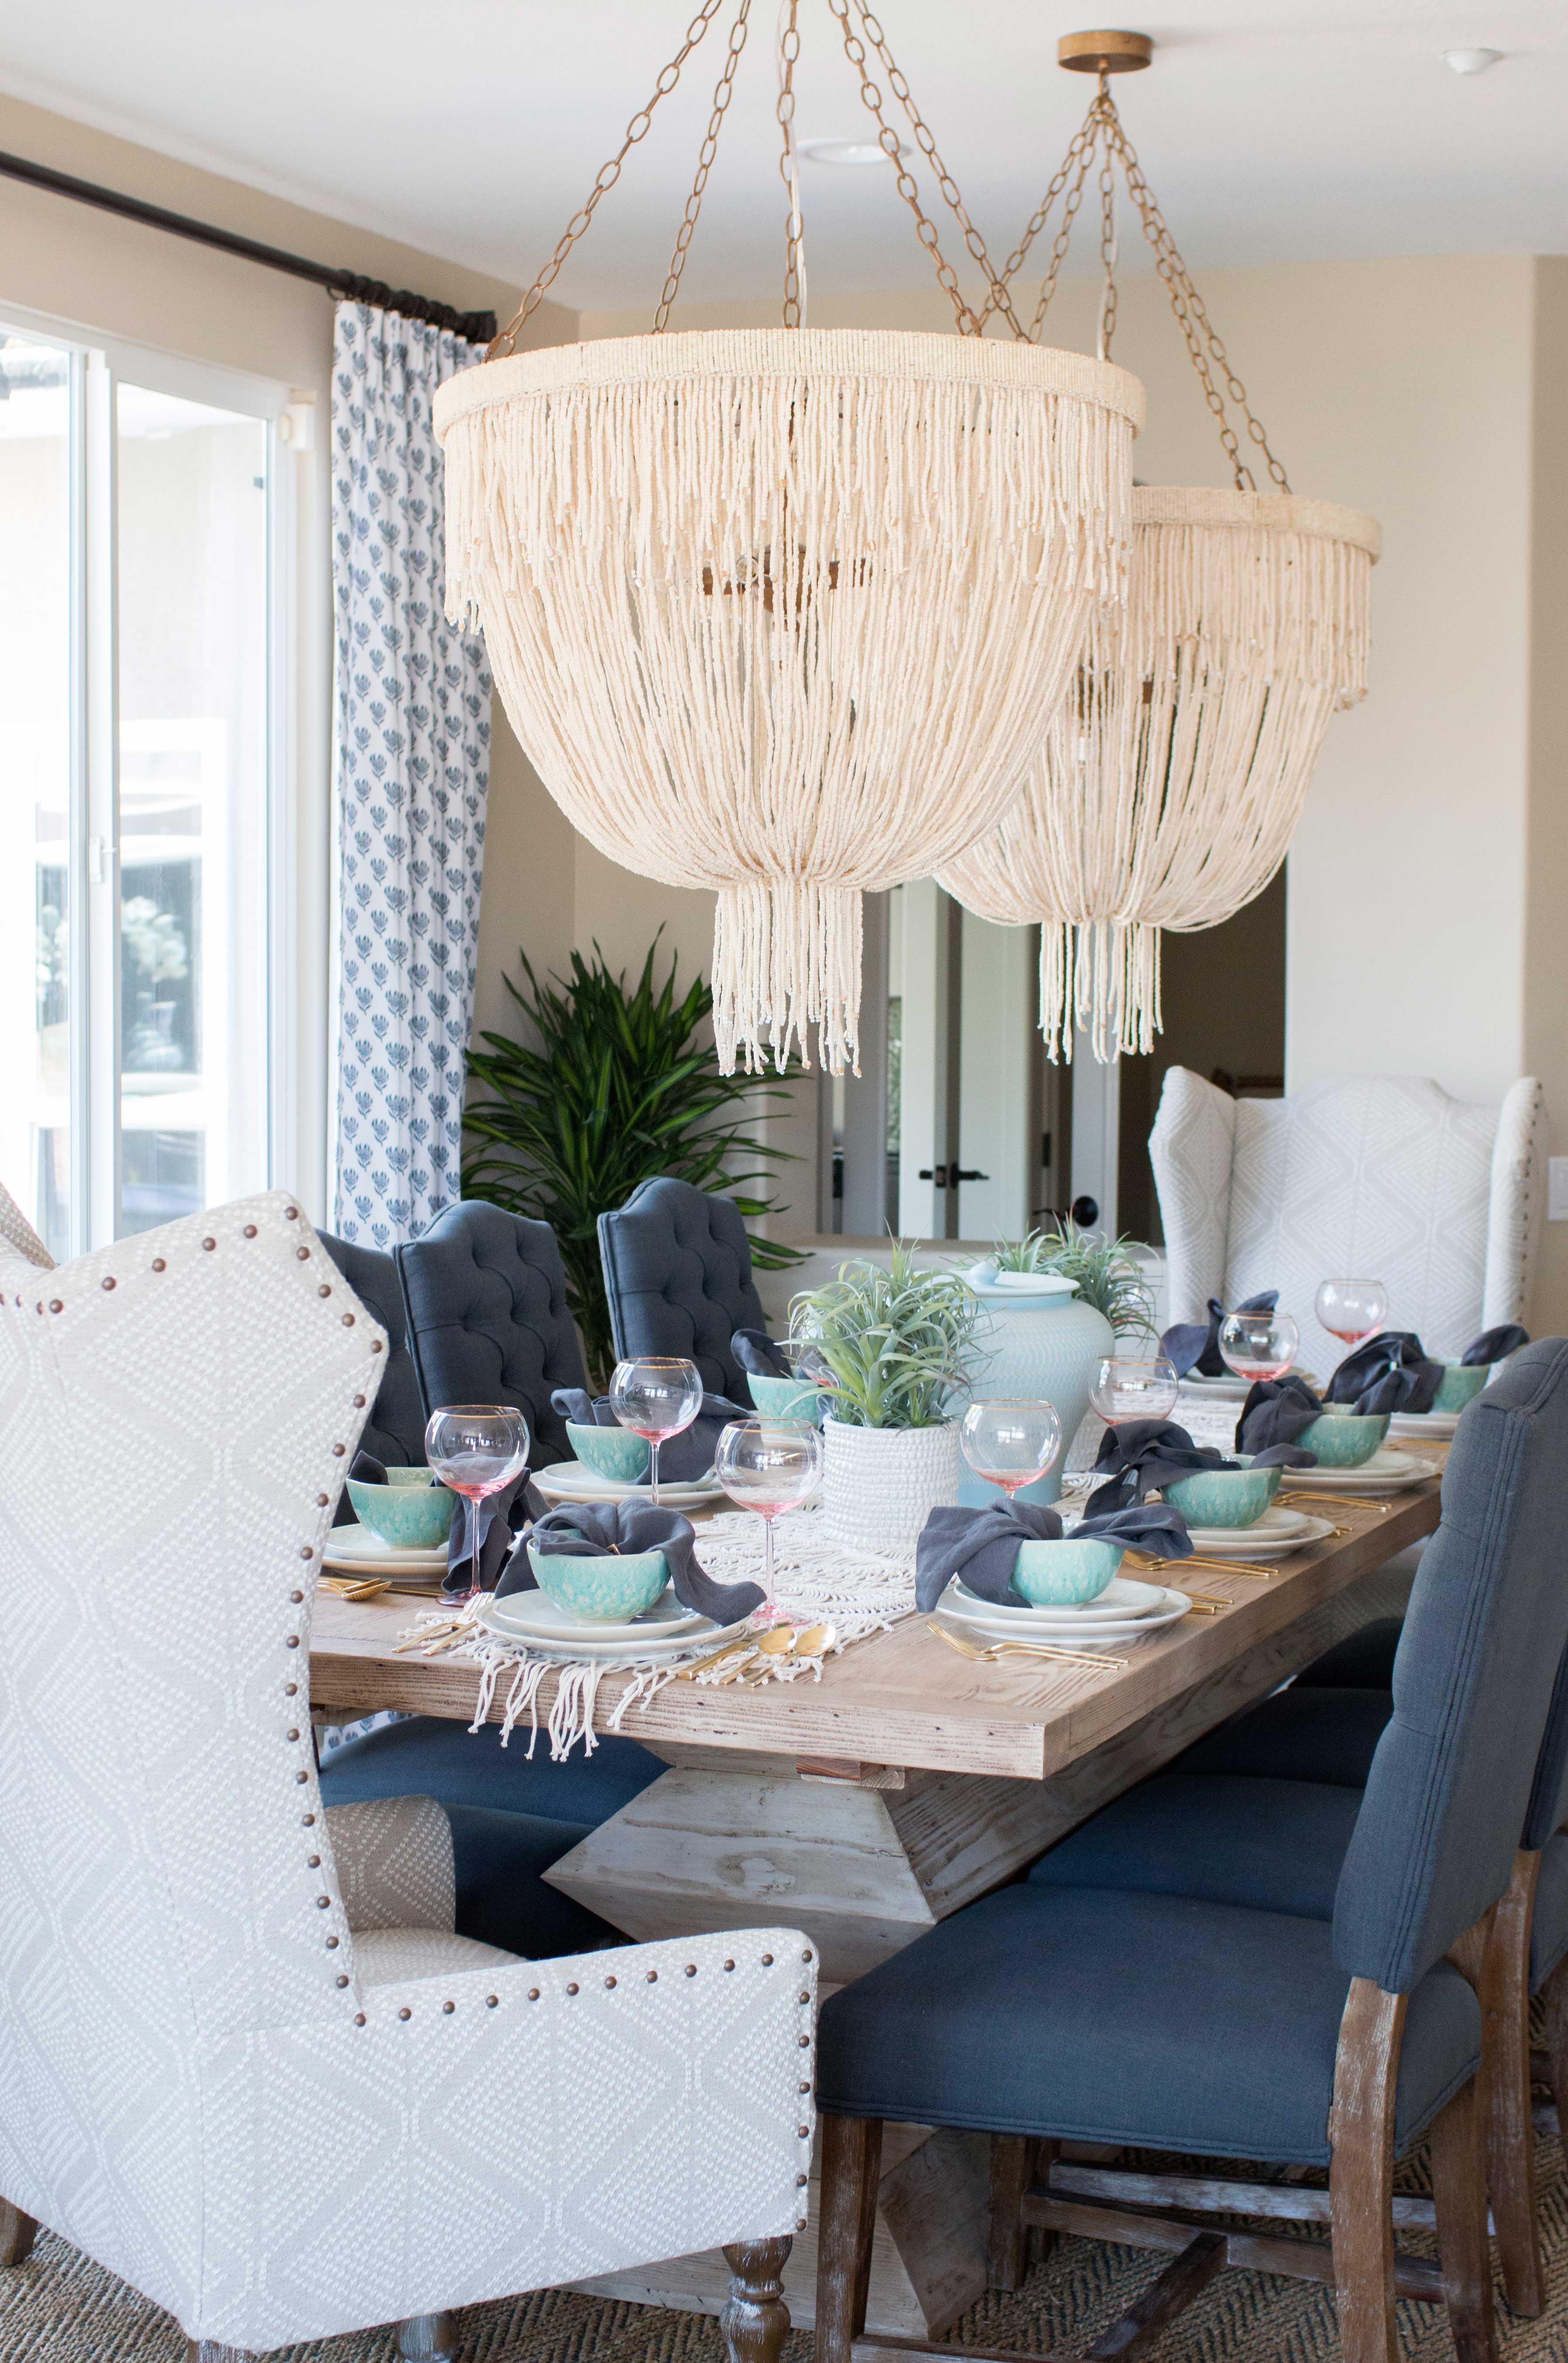 blackband_design_dining_table_setup_3